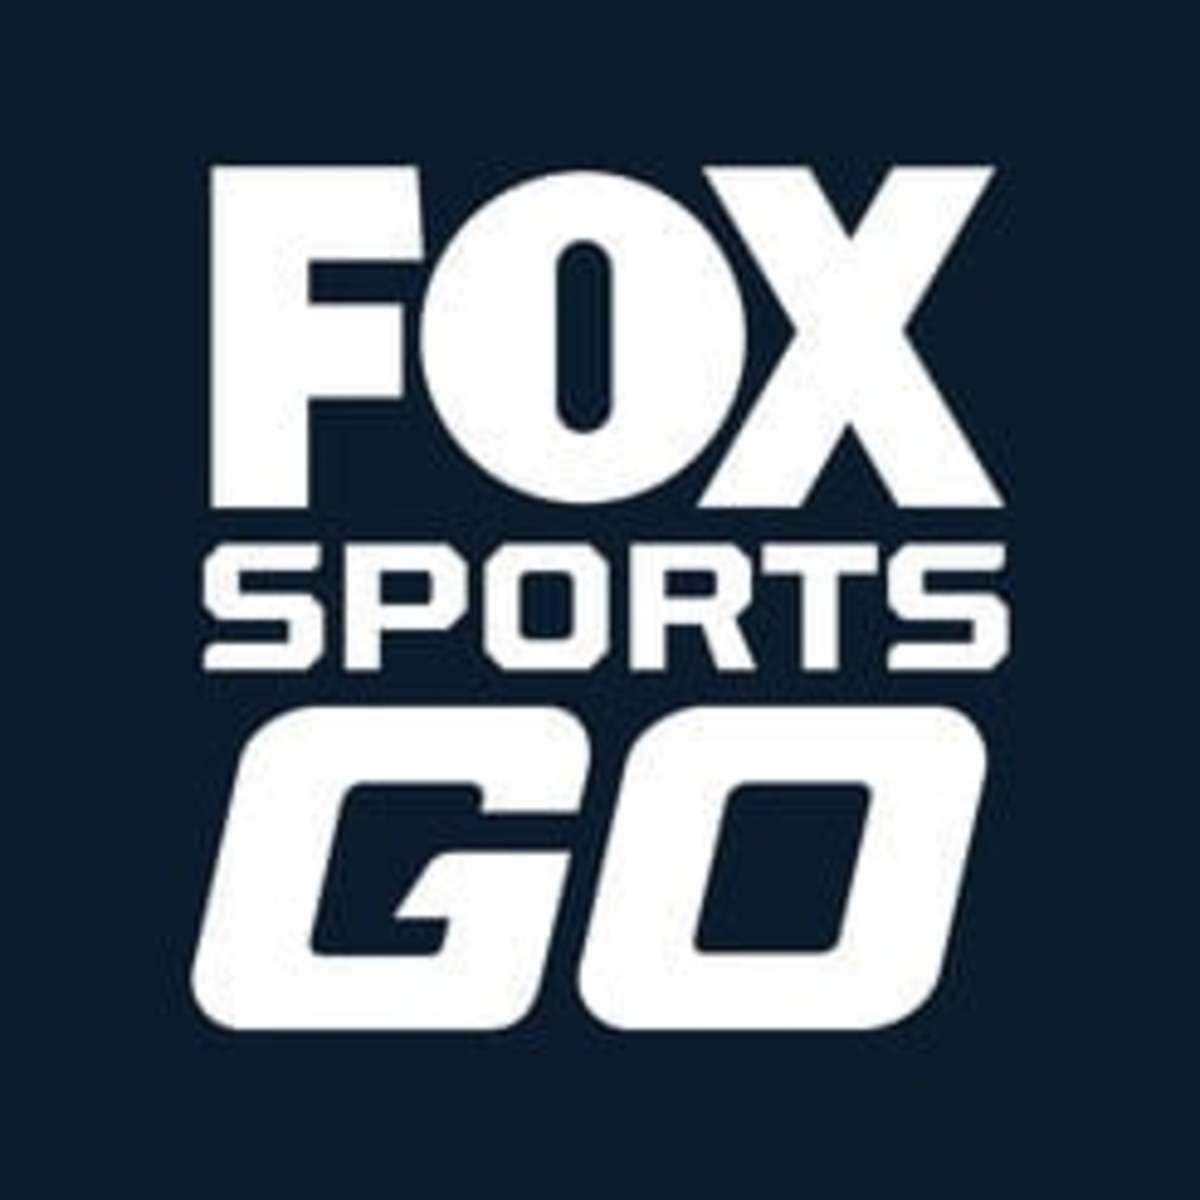 NASCAR live stream: Fox Sports Go